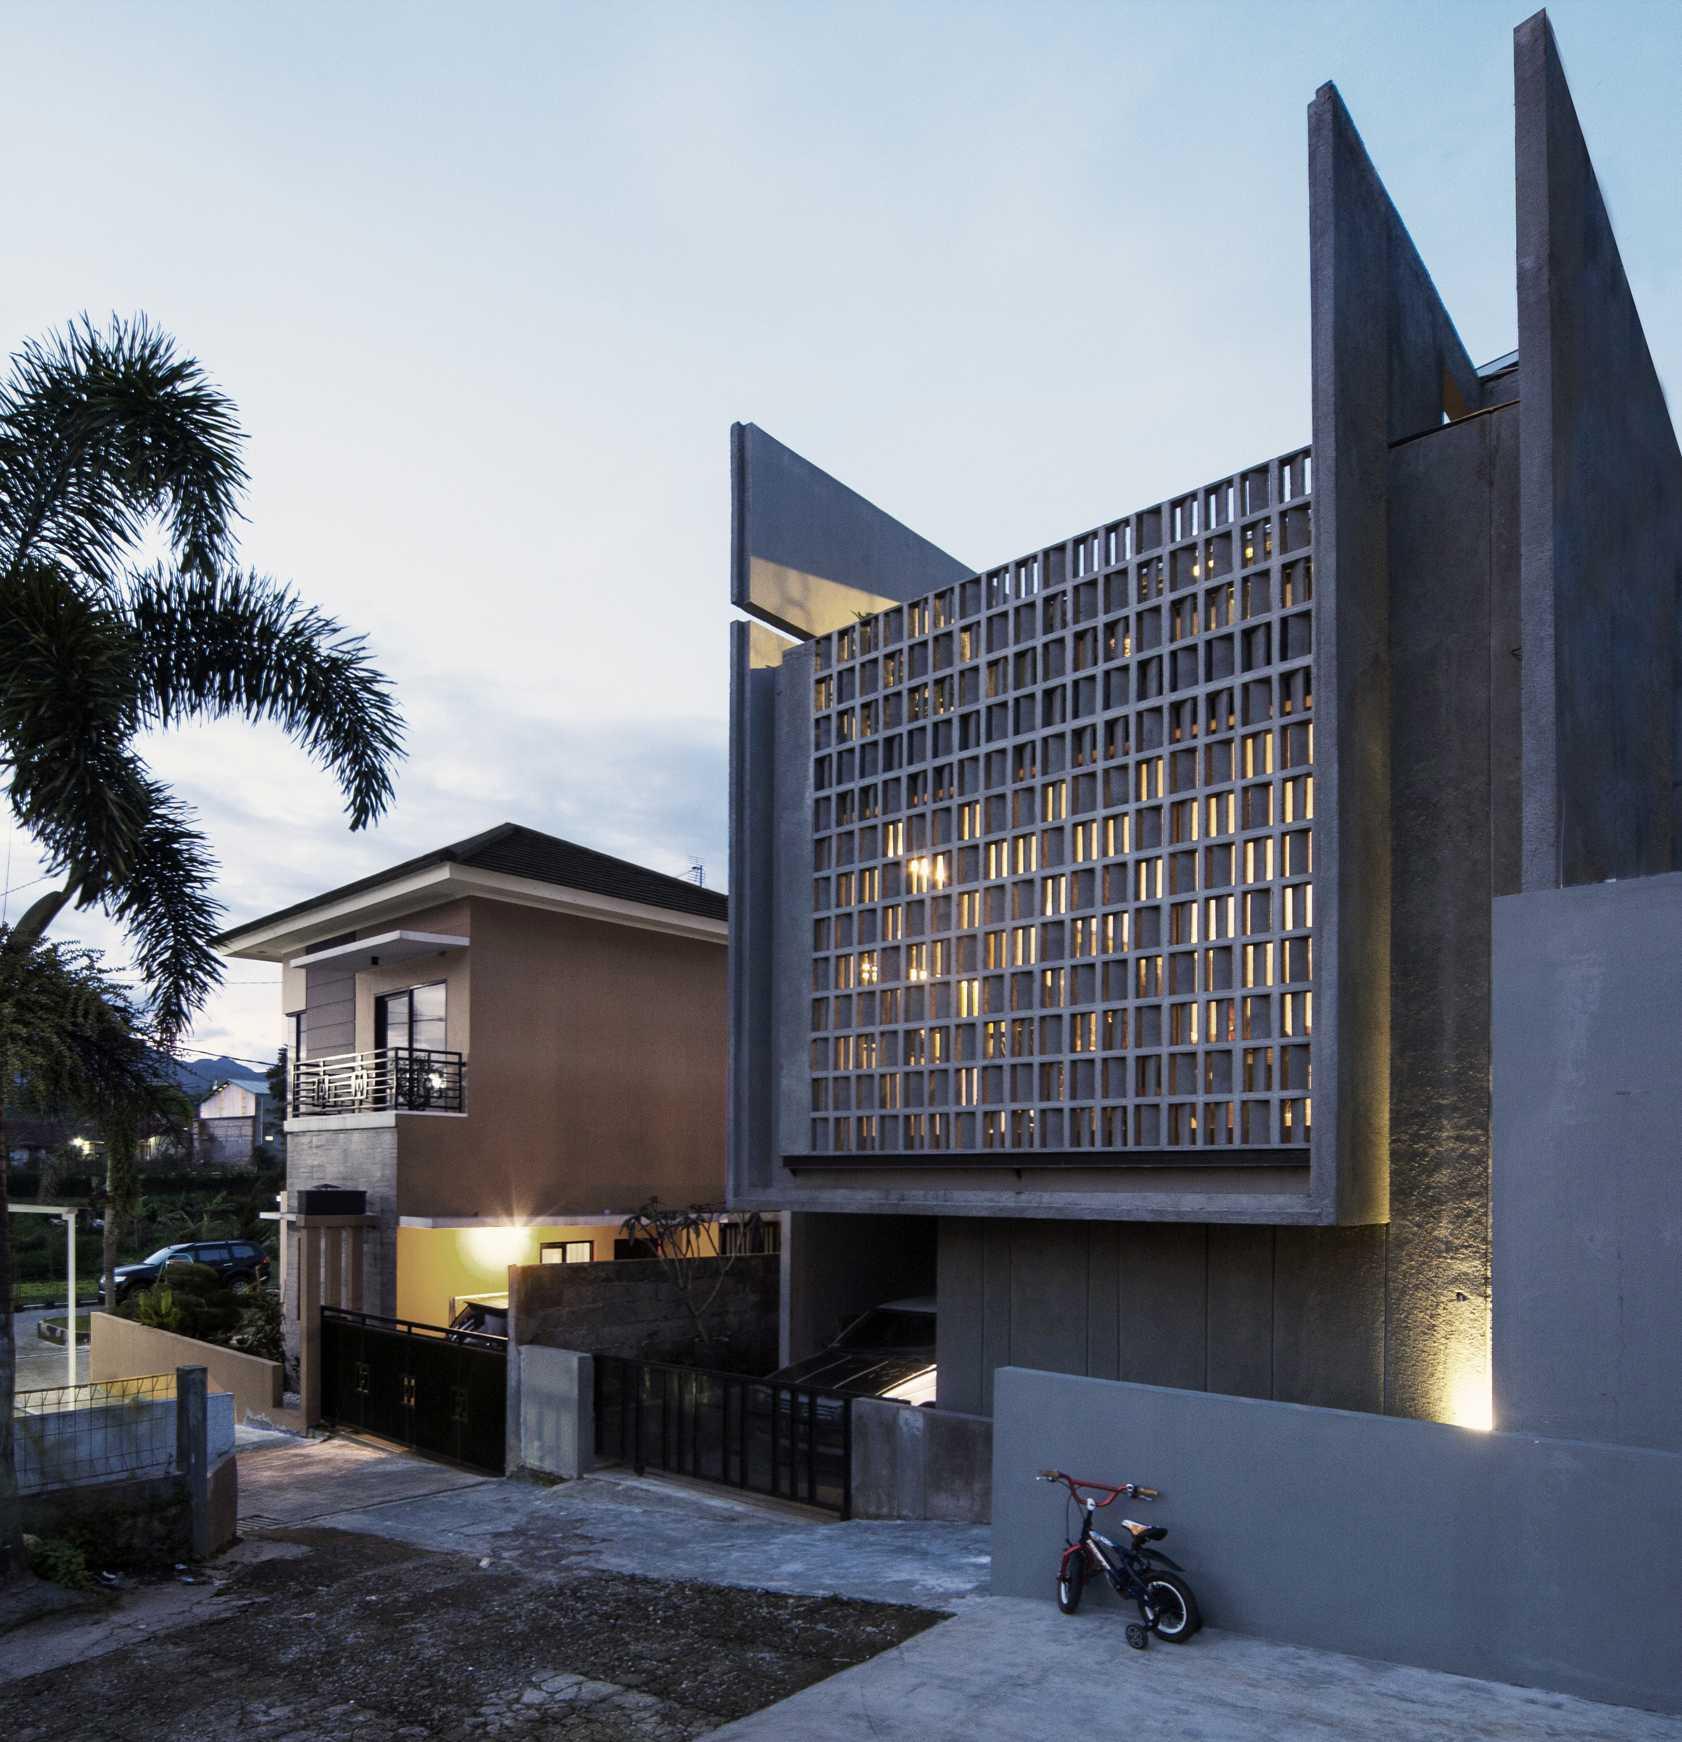 Eben The Mighty Mini - Conformable Minimax House Bandung Bandung Front-Elevation-4-Leo-Kawun   16110